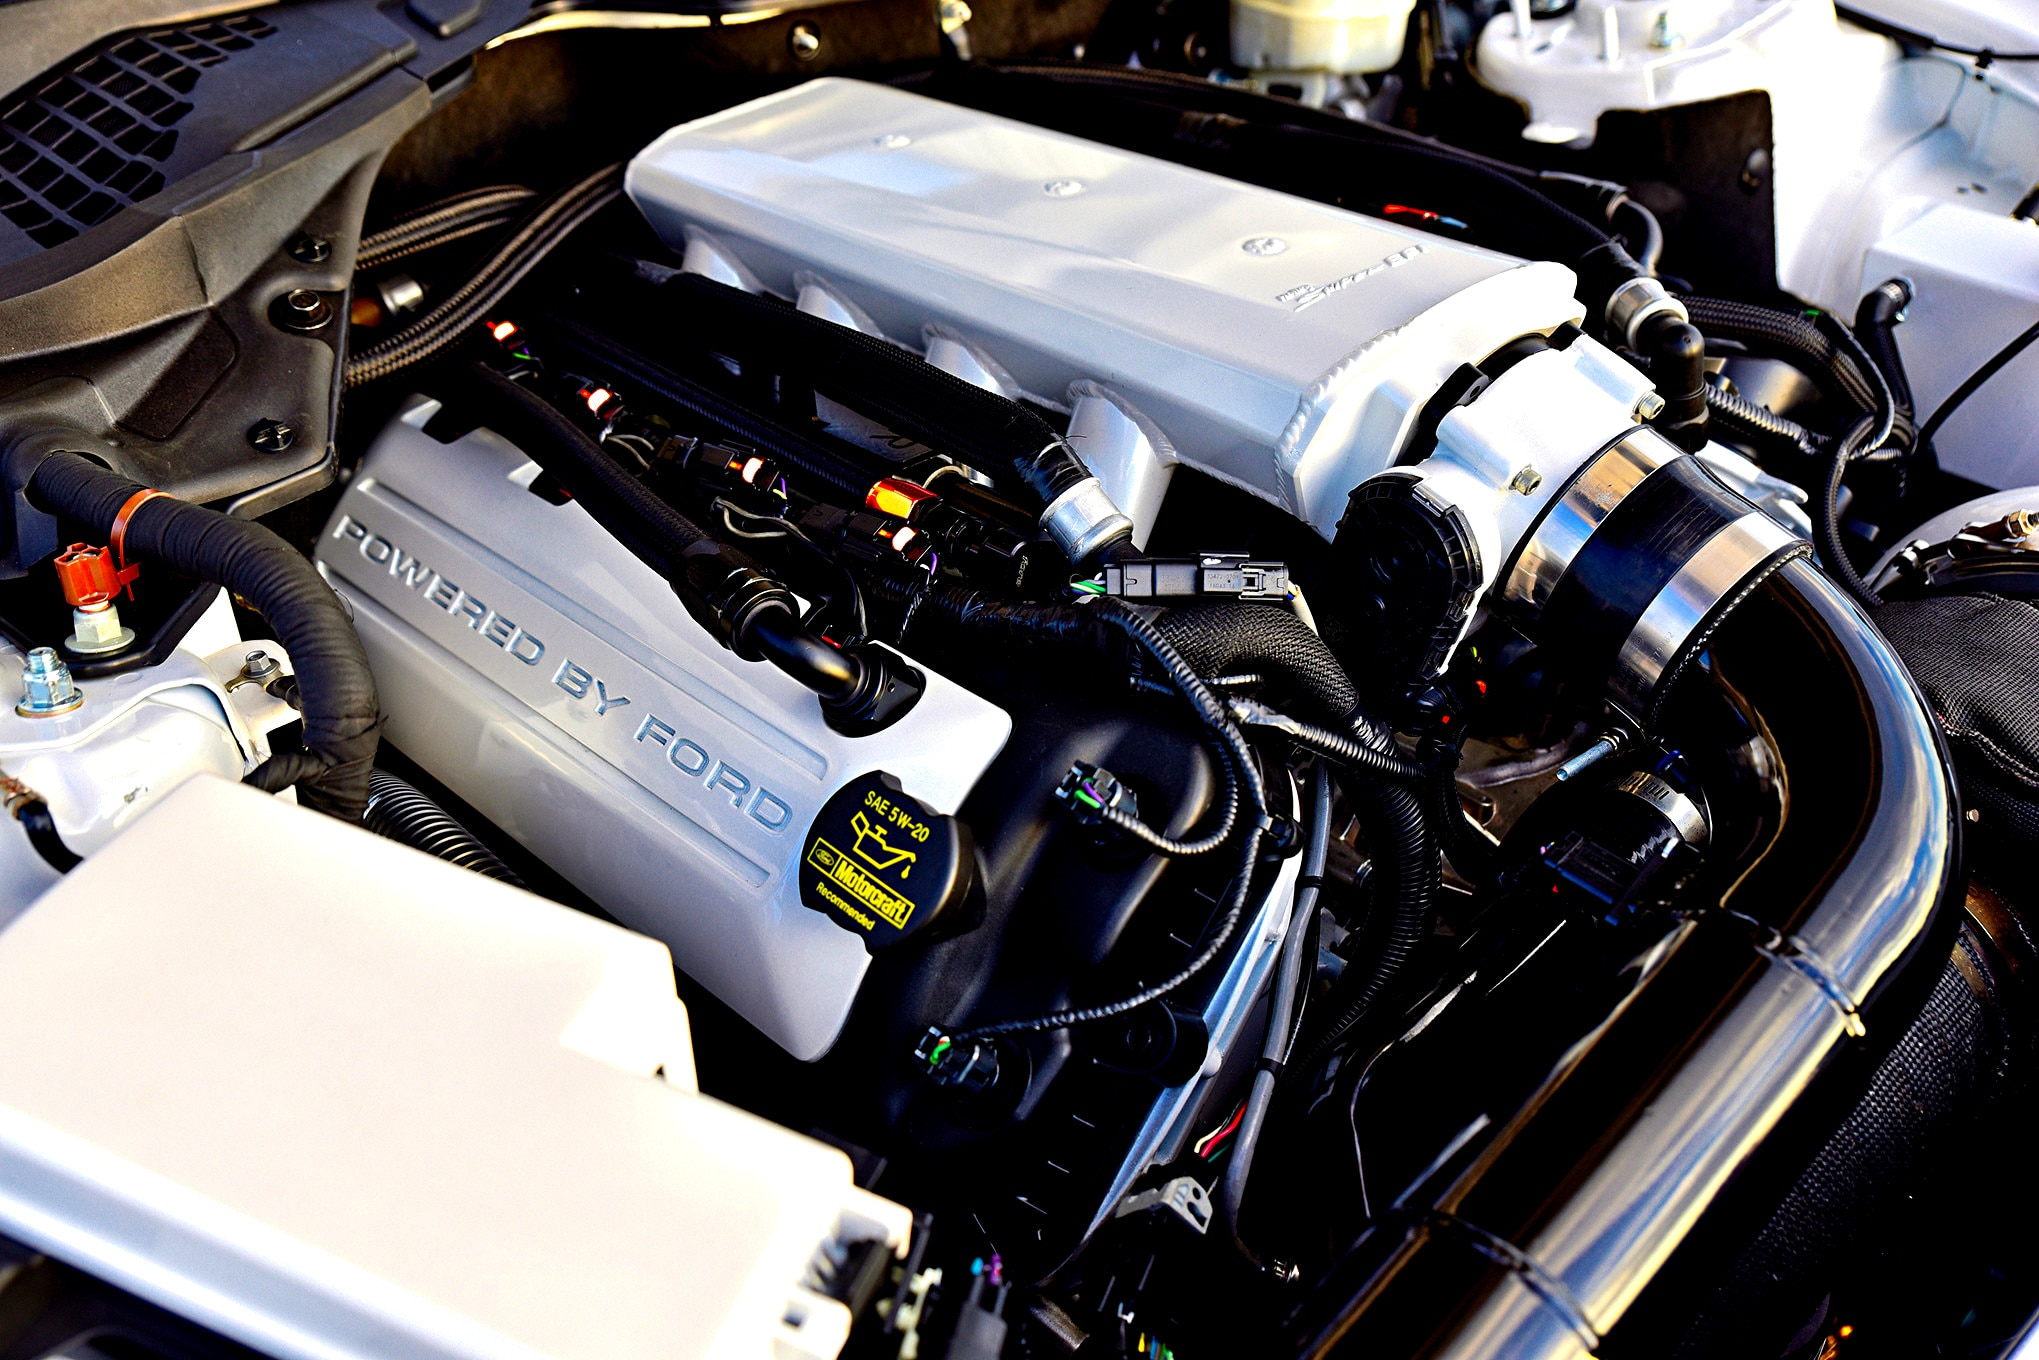 Sheldon Lewis S550 Ford Mustang 016